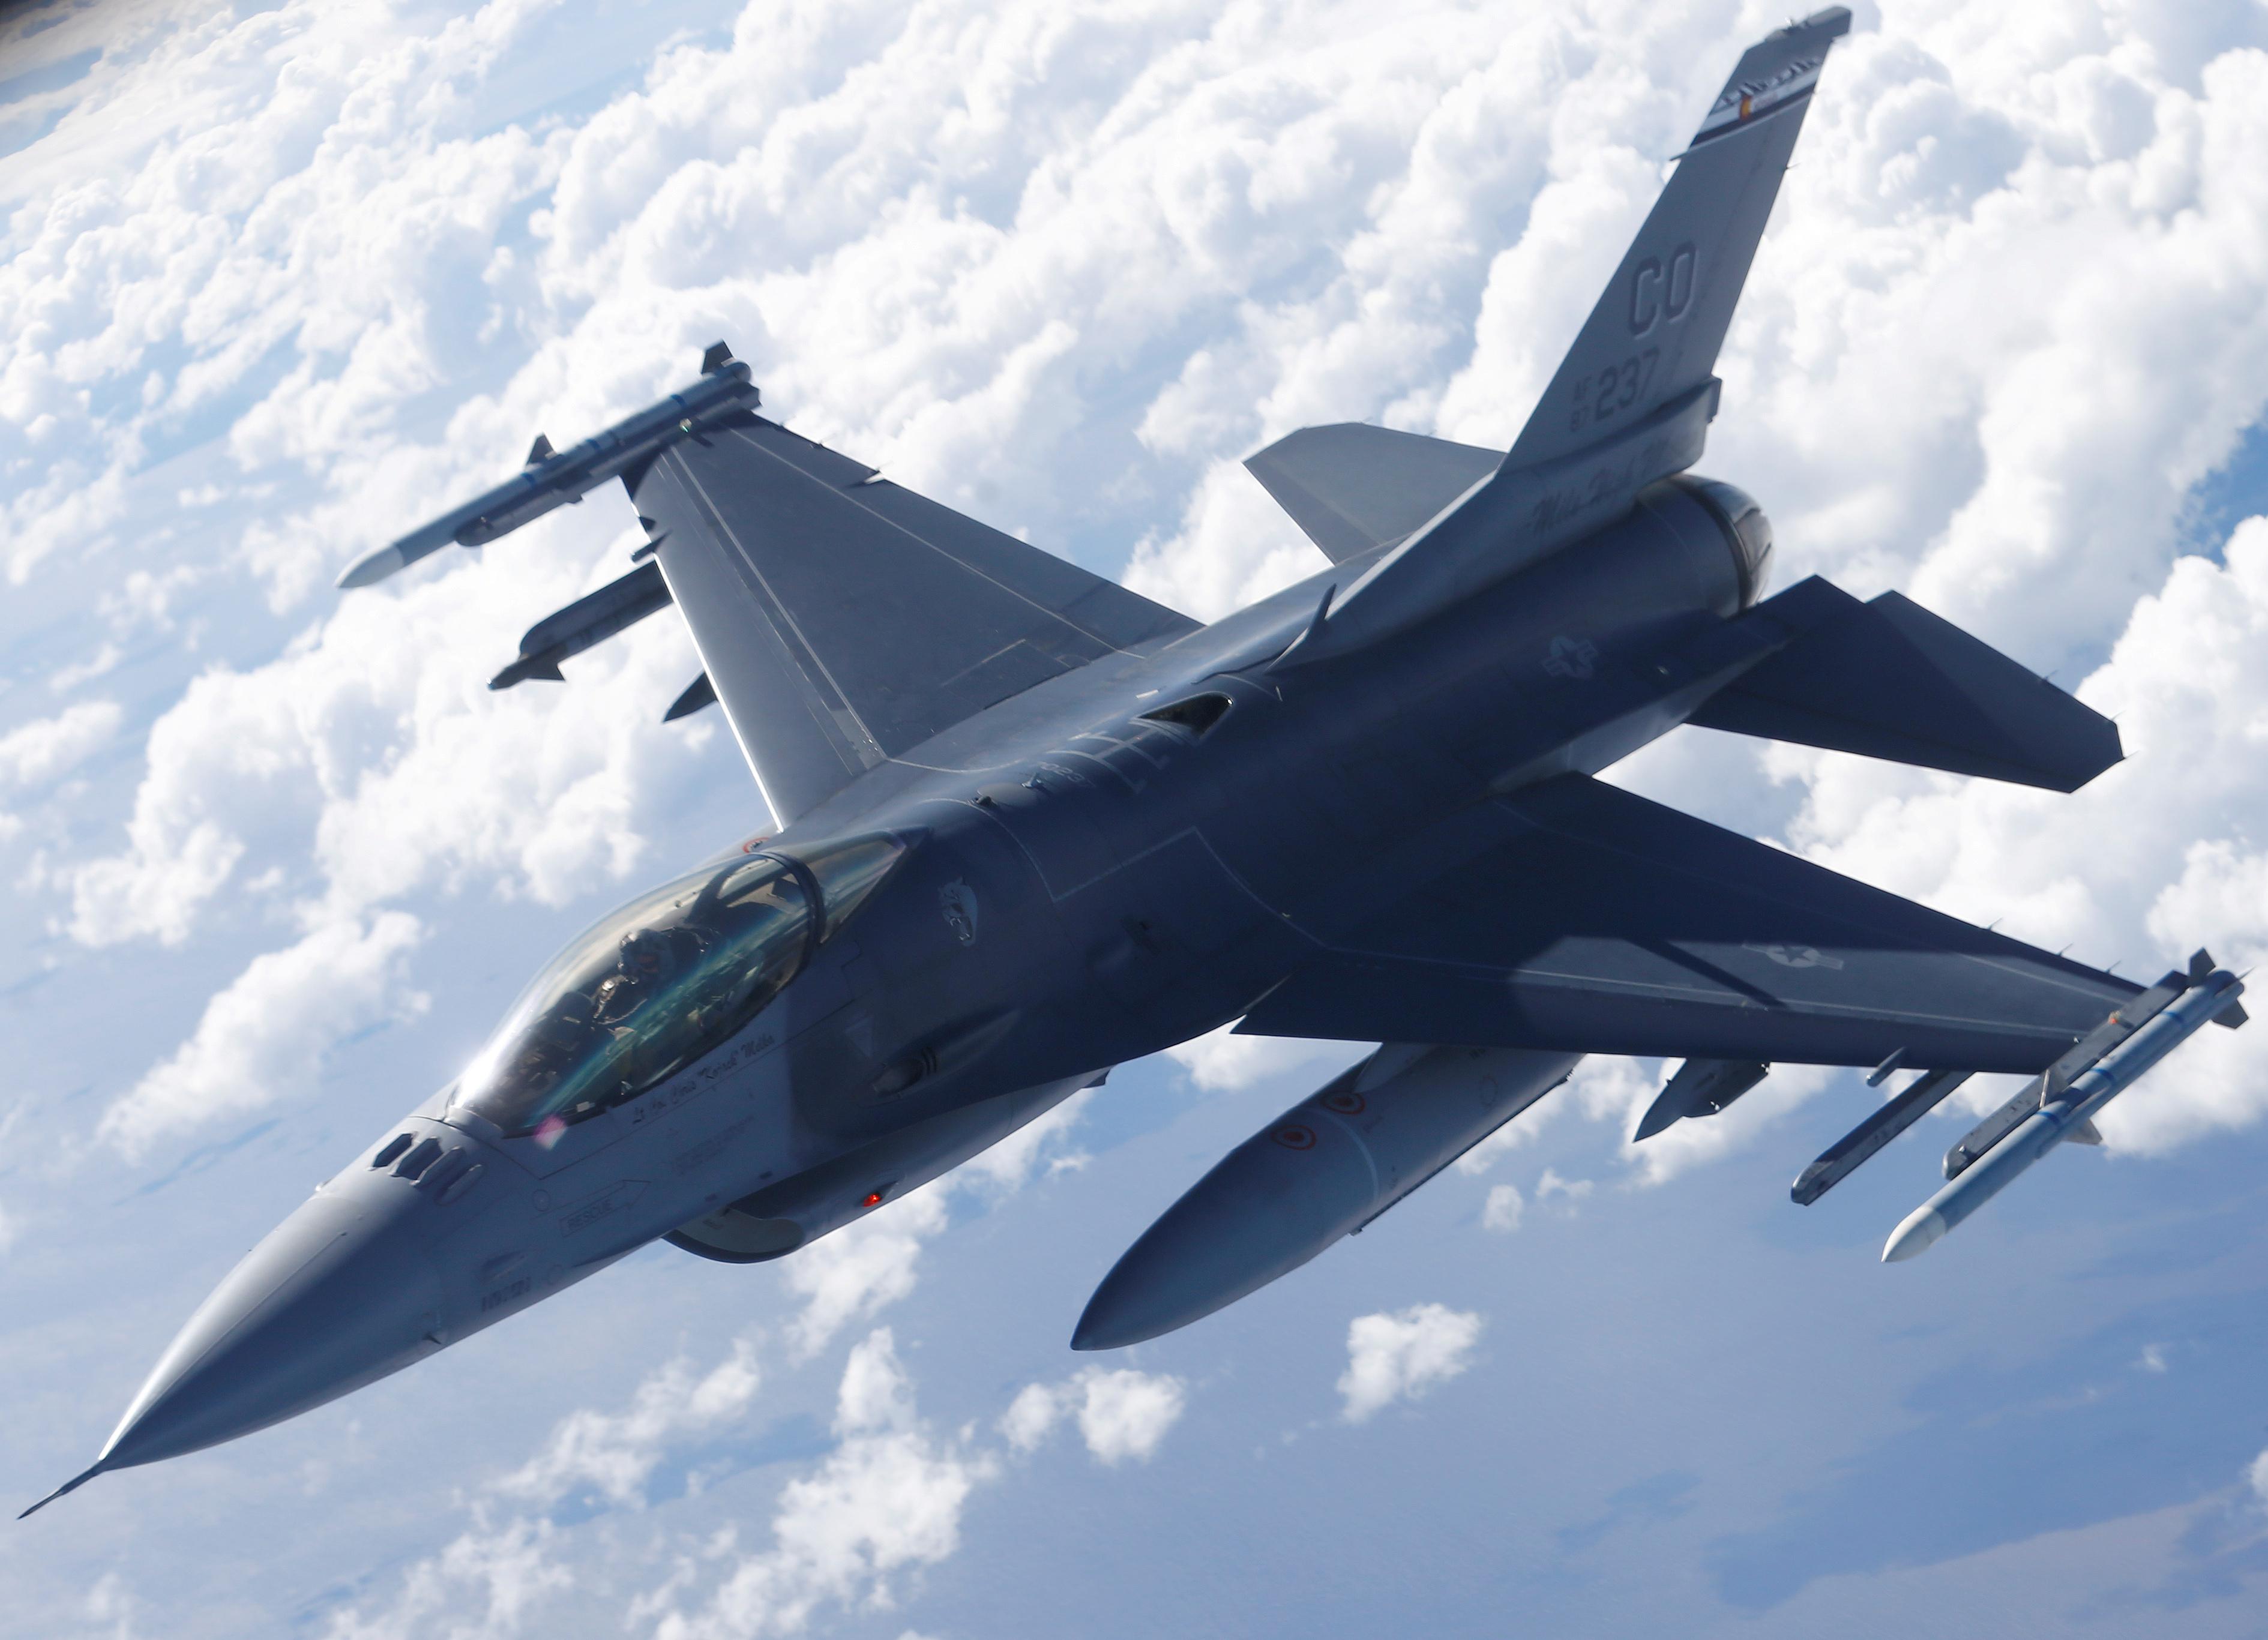 US Republican Senators Push for $8 Billion F-16 Fighter Jets Sale to Taiwan